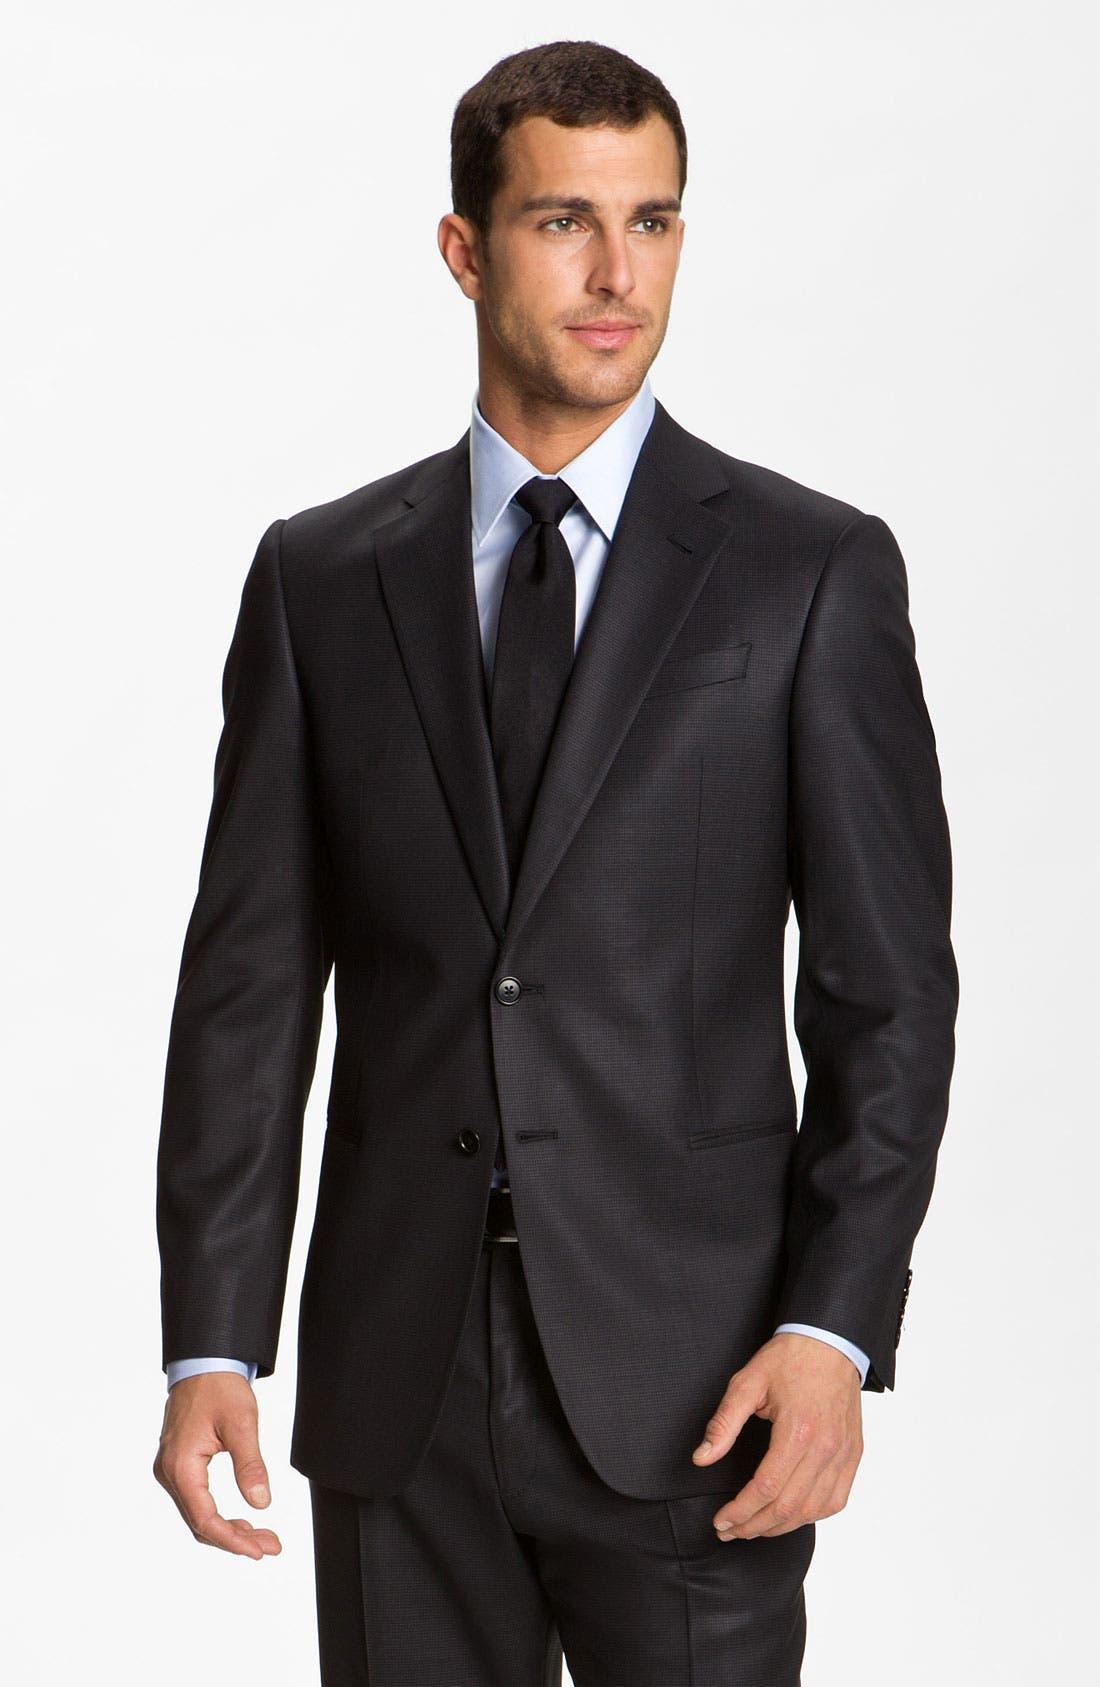 Alternate Image 1 Selected - Armani Collezioni 'Giorgio' Trim Fit Wool Suit